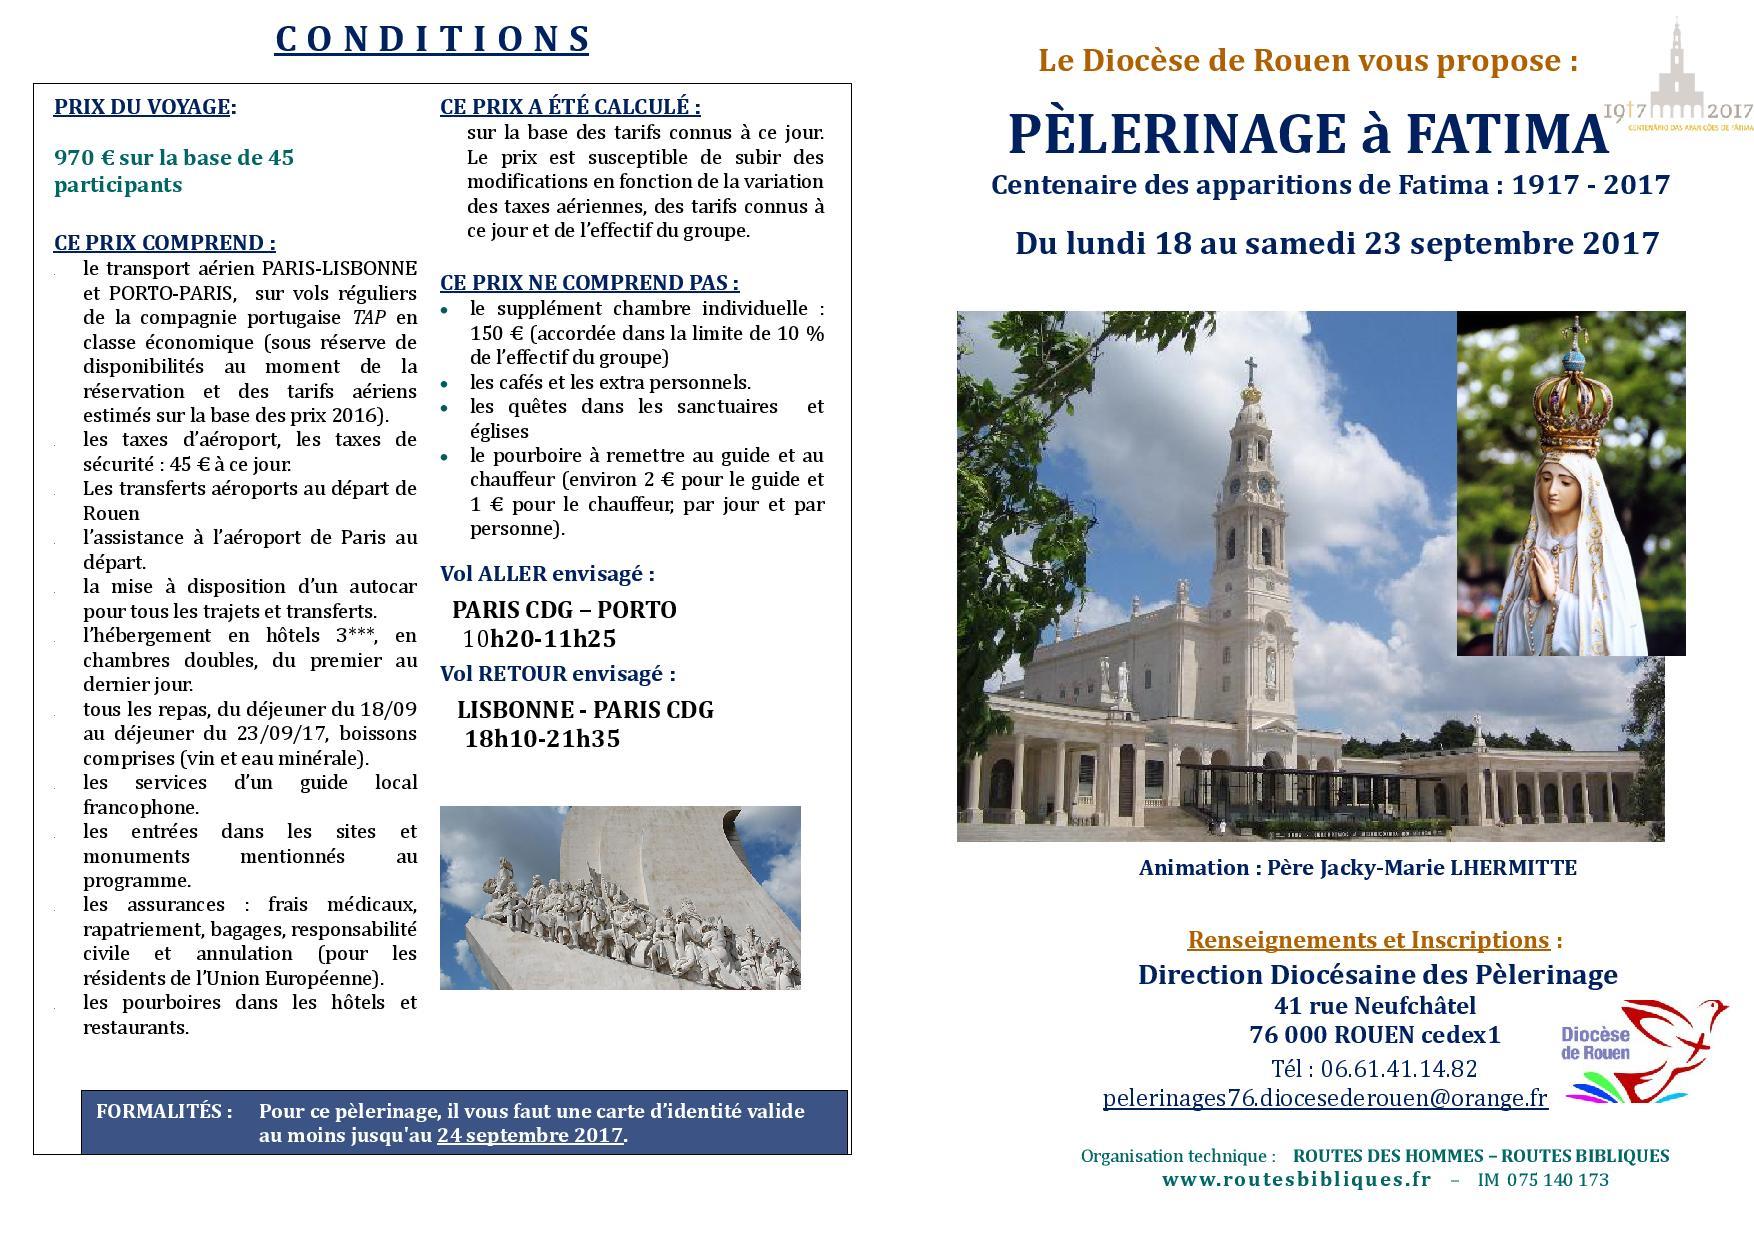 depliant-fatima-2017-v3-page-001